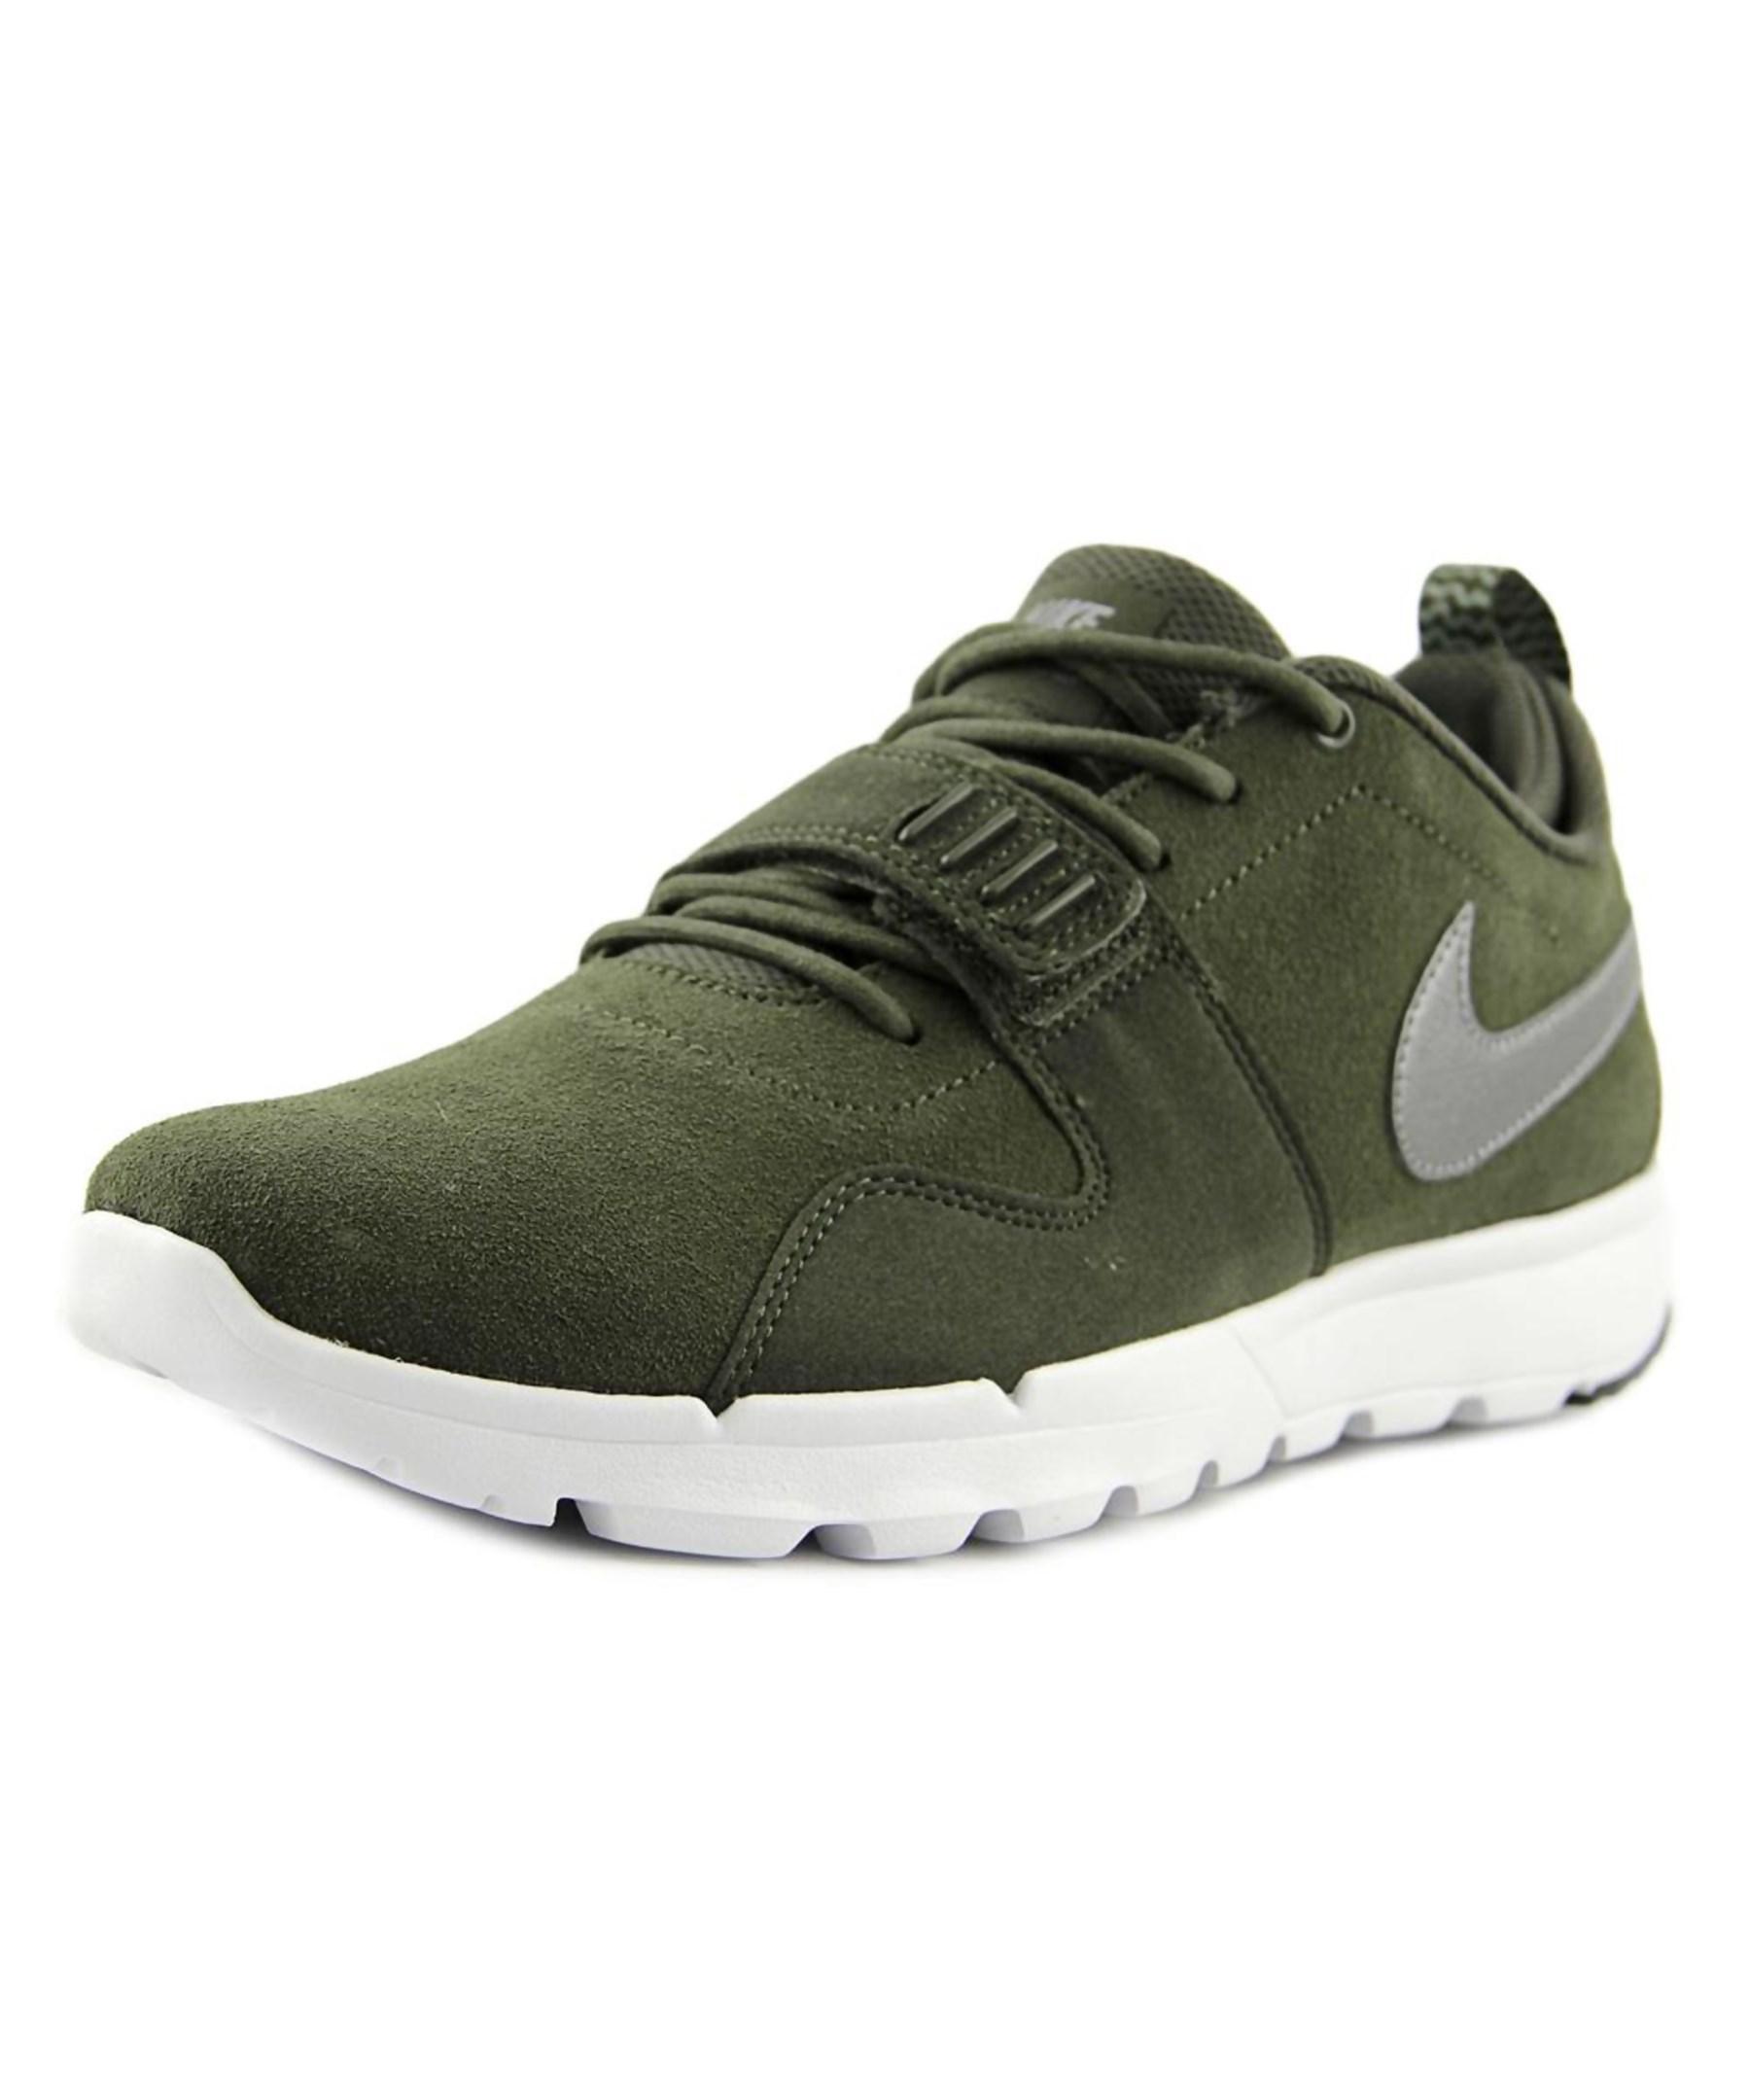 50ce37a3e8ed Nike Trainerendor L Men Round Toe Suede Green Trail .